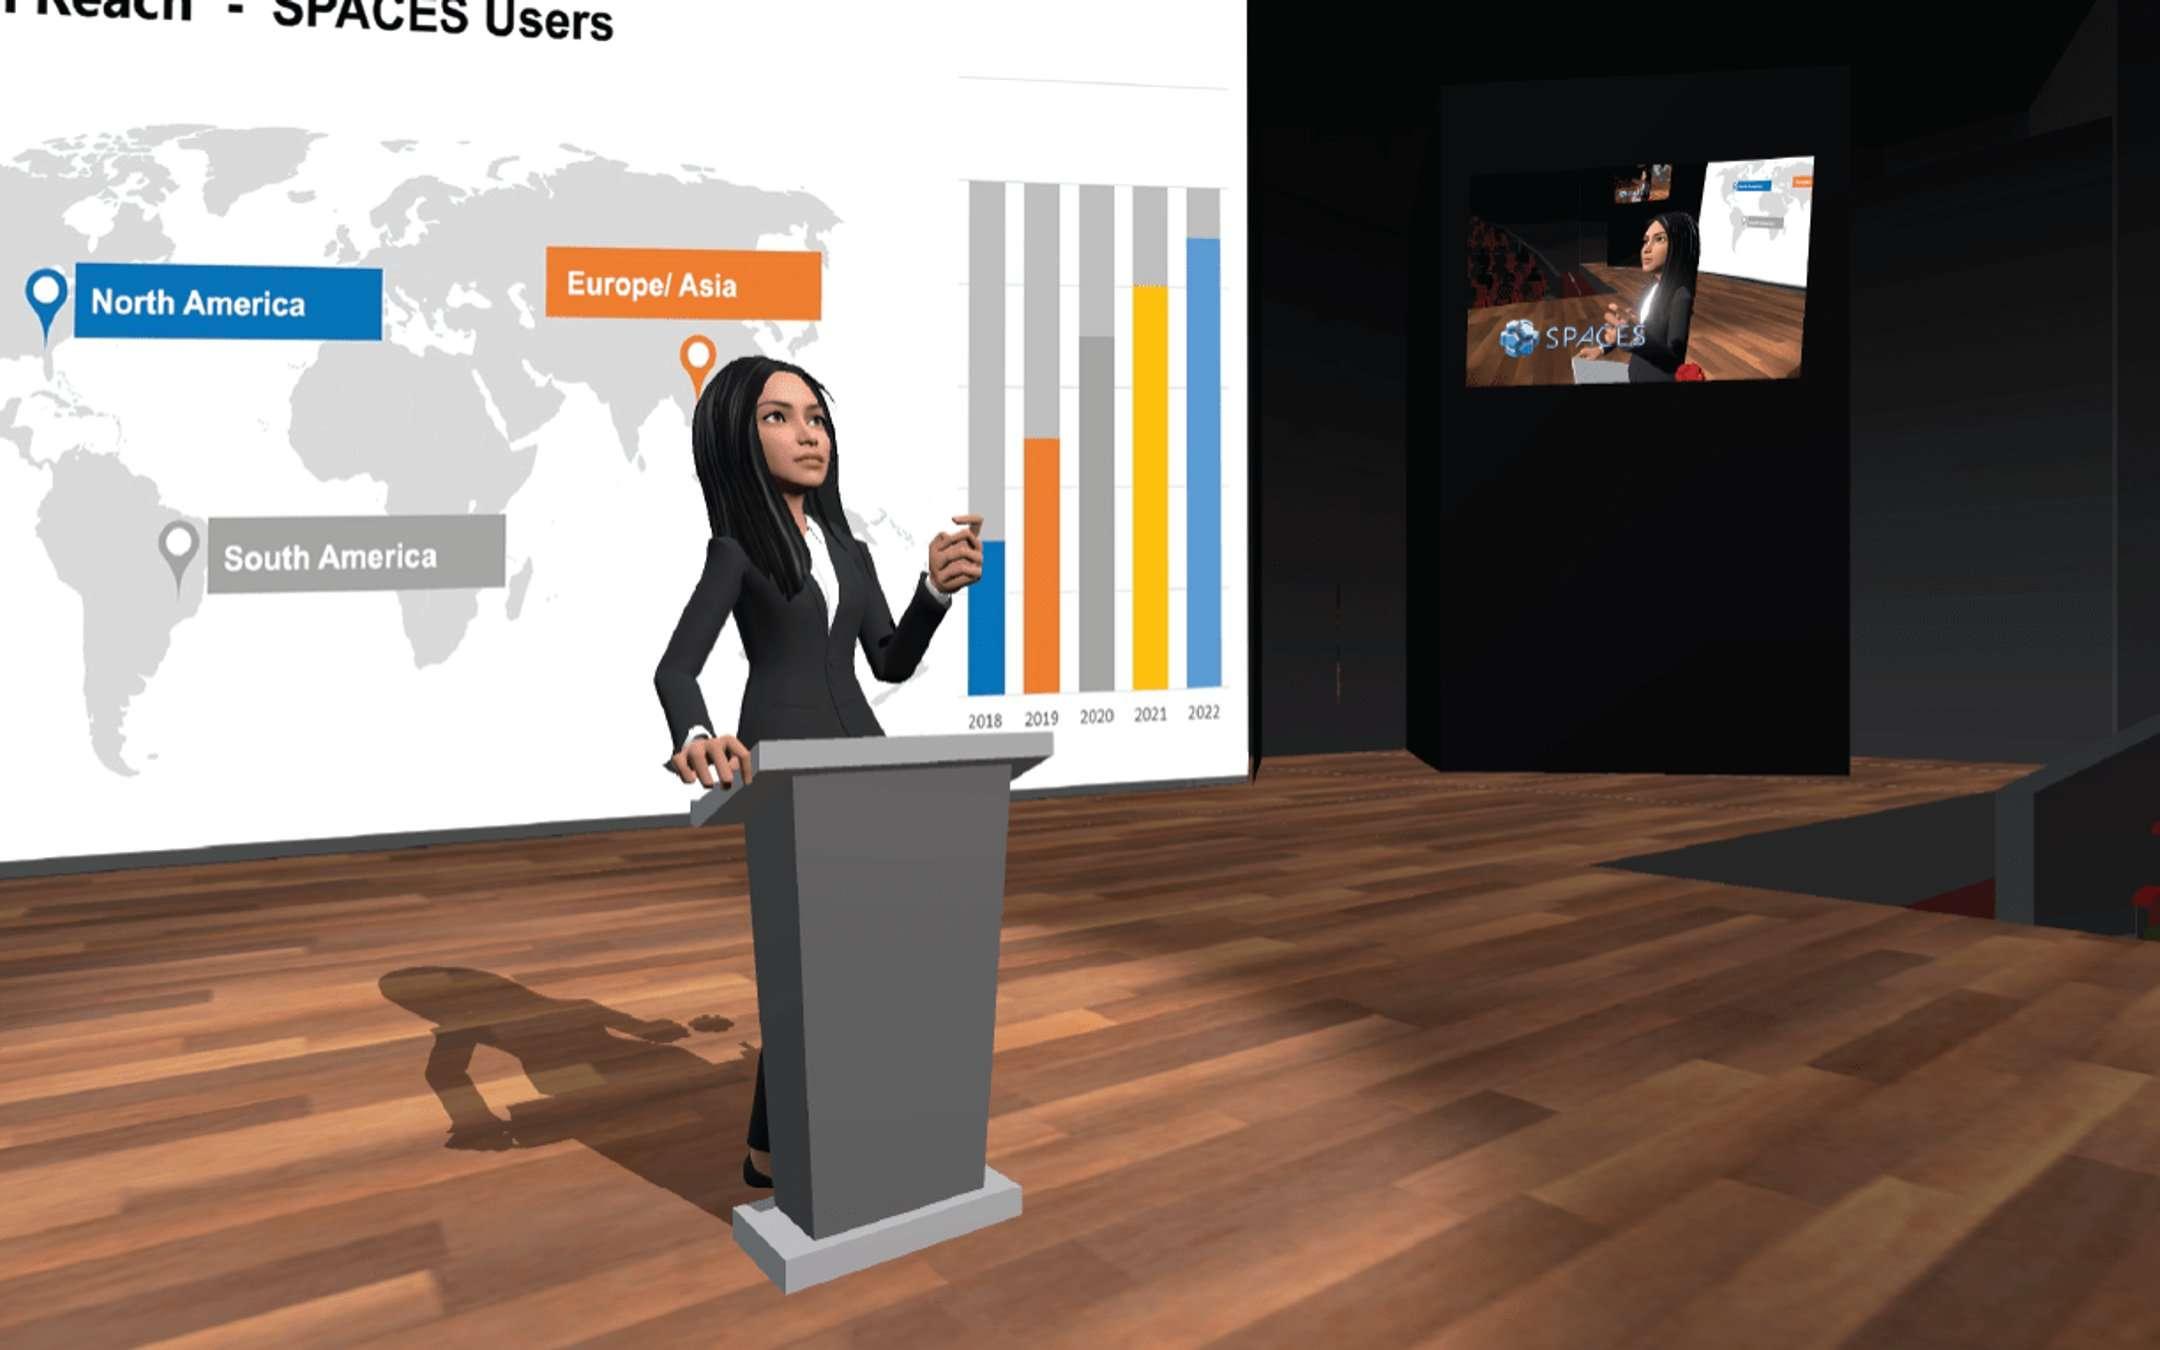 Apple buys Spaces virtual reality